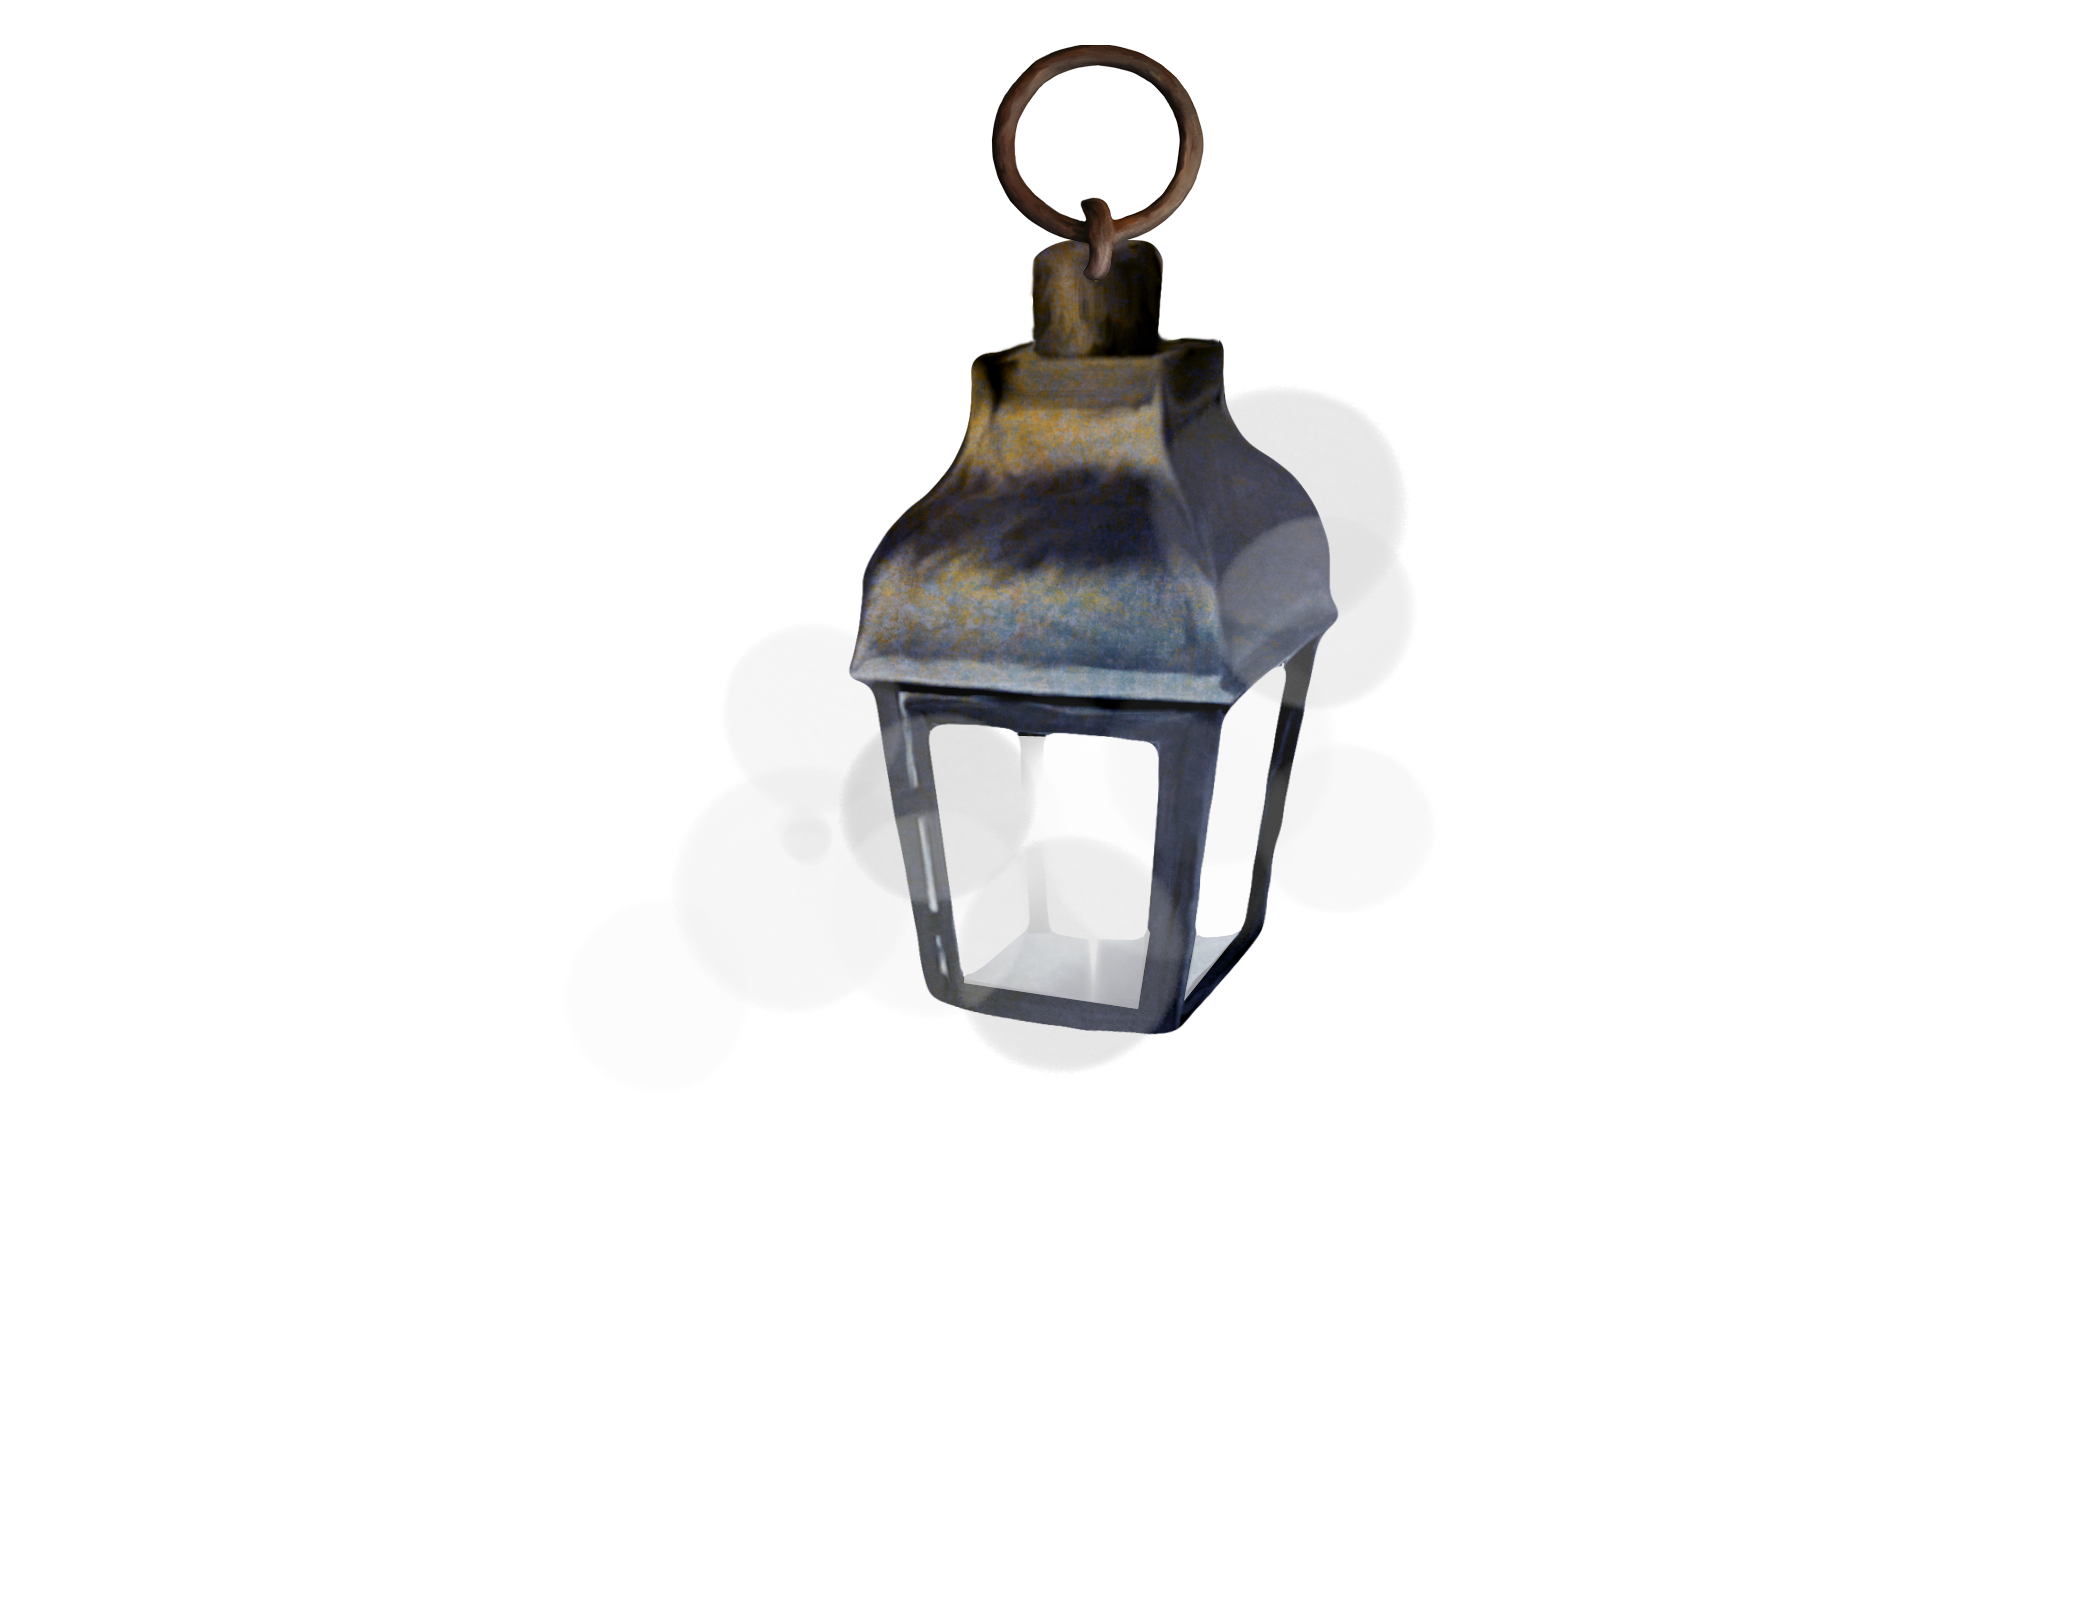 фонарик для гномика картинки публикуем